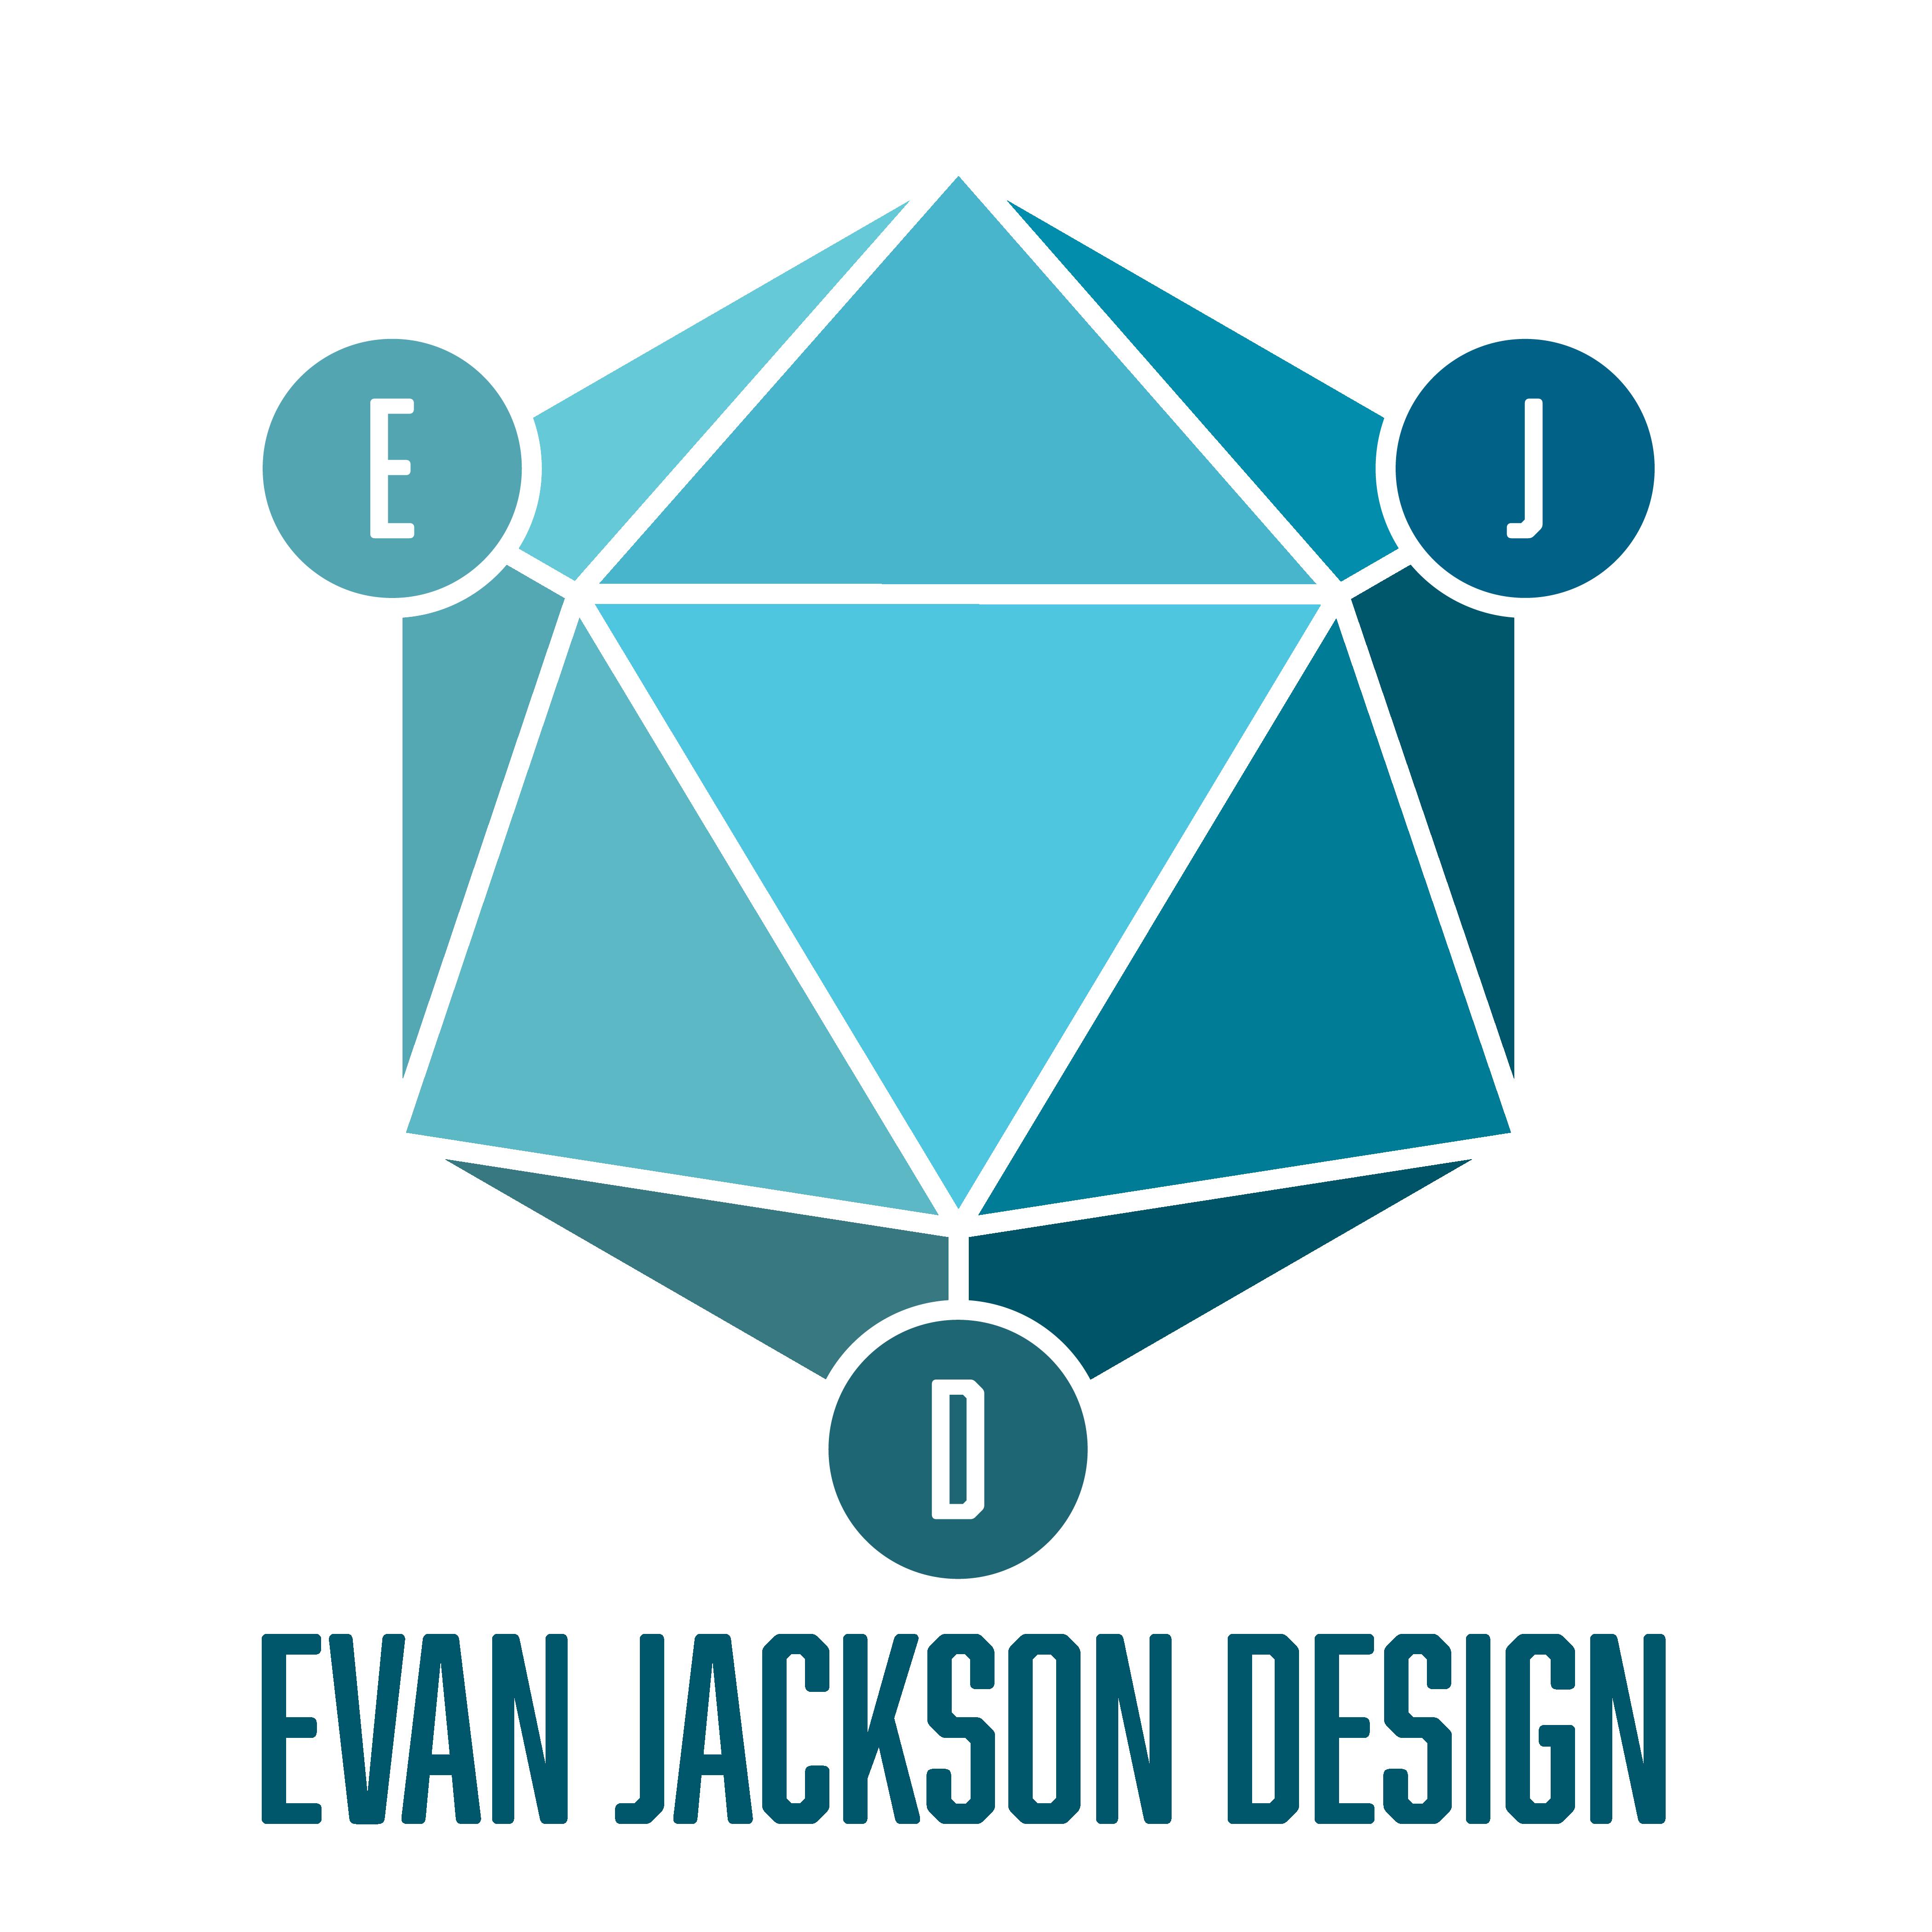 Evan Jackson